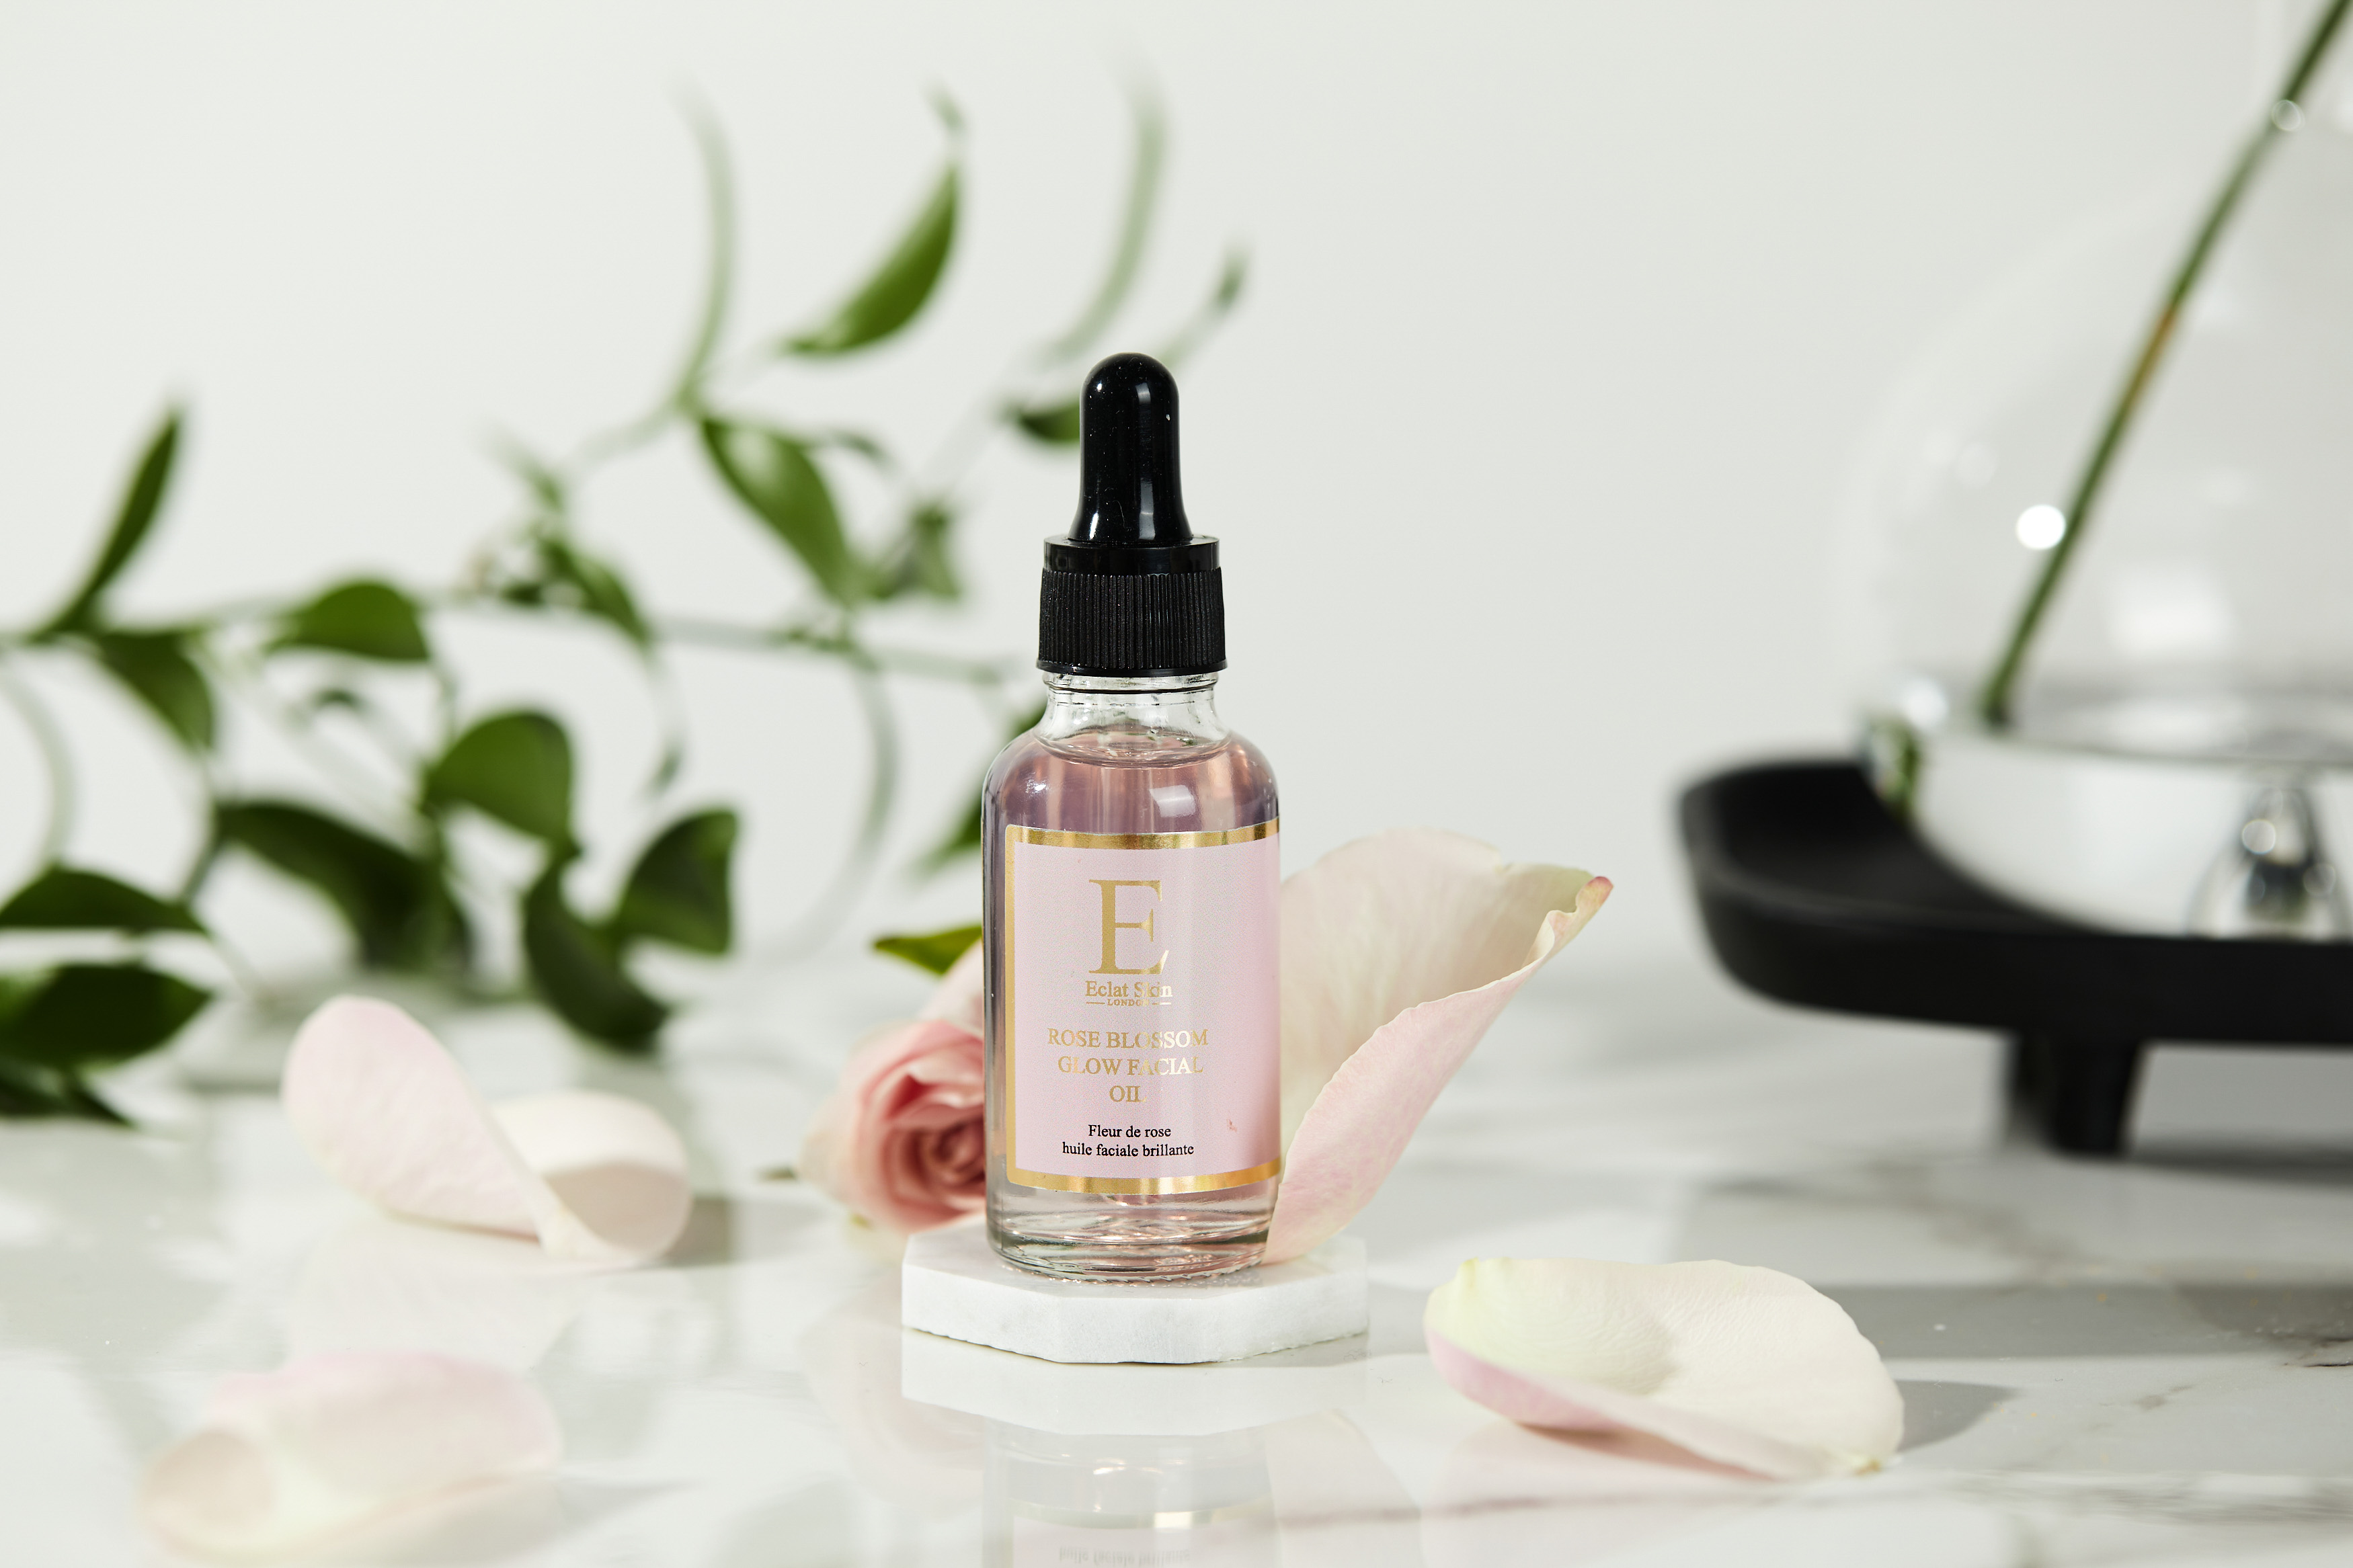 oli nella beauty routine